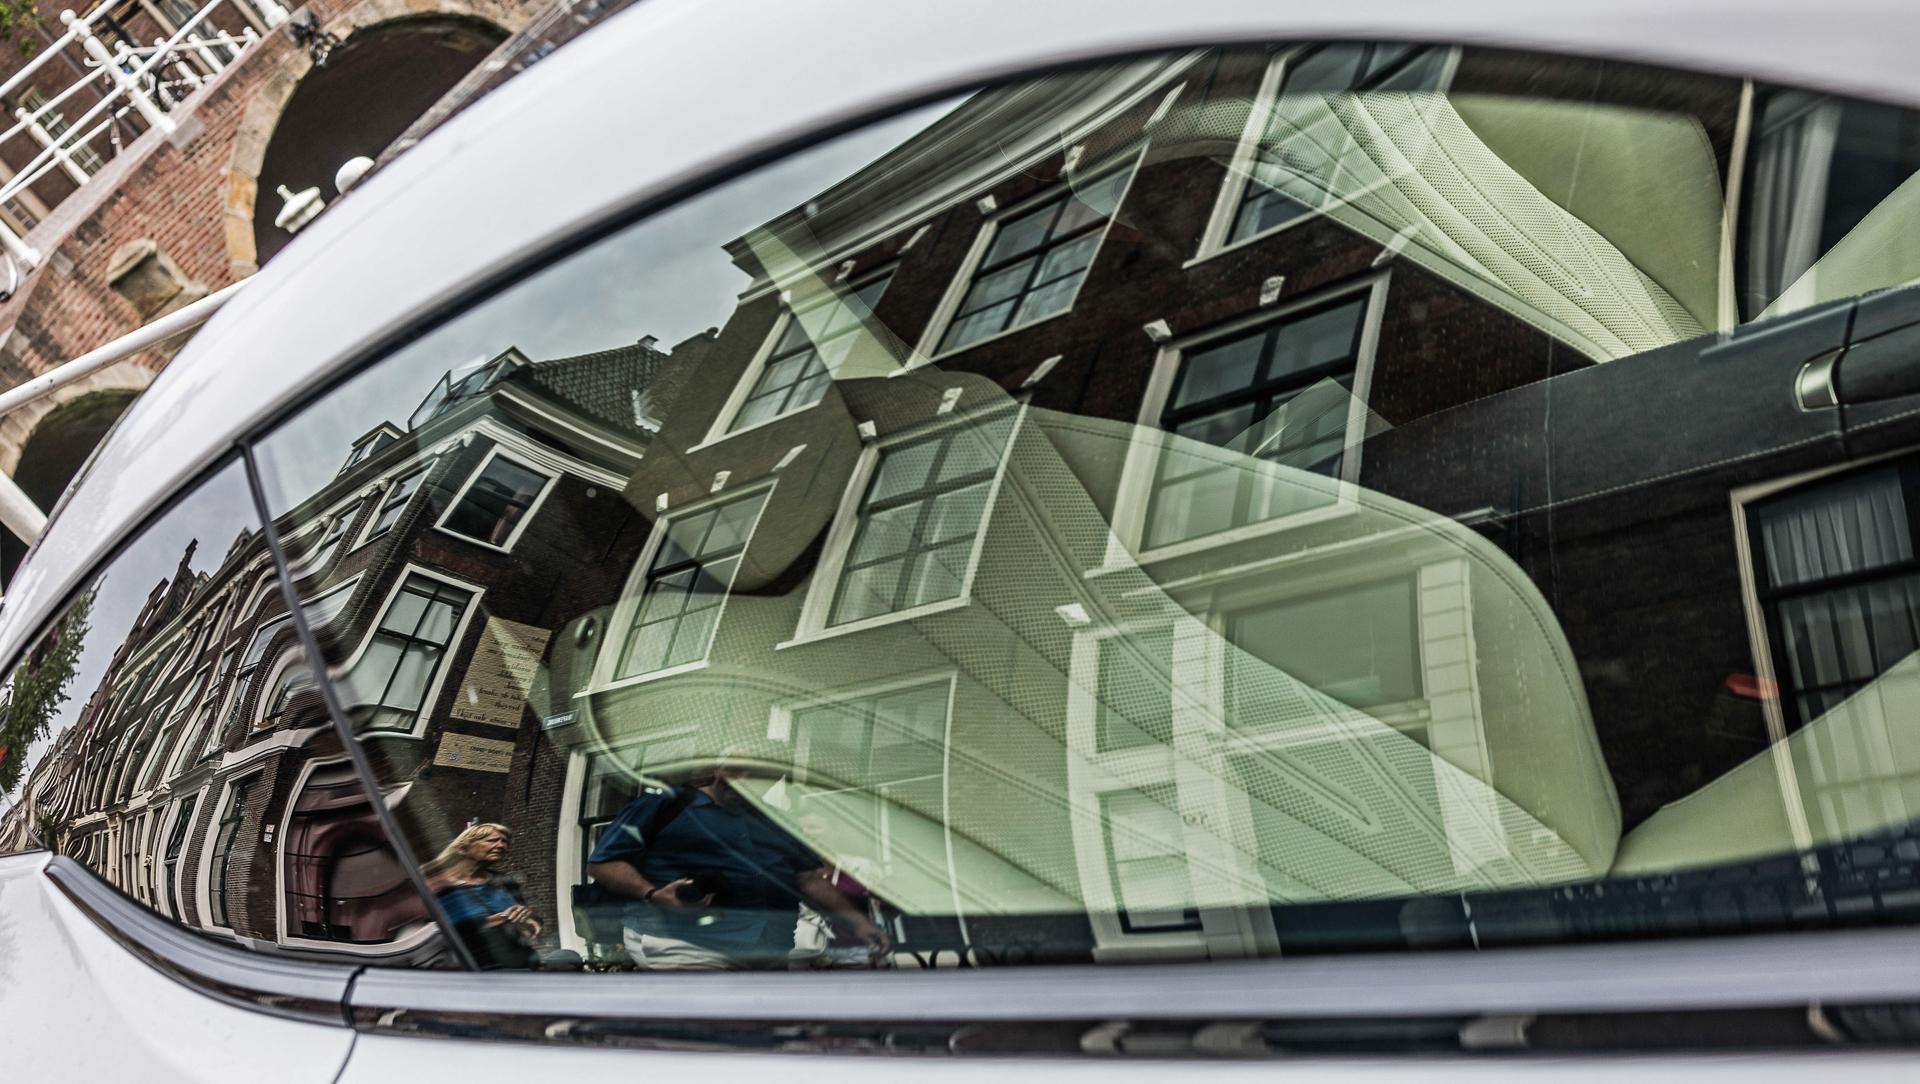 Leiden-2018_72dpi-1920px_DSC05355